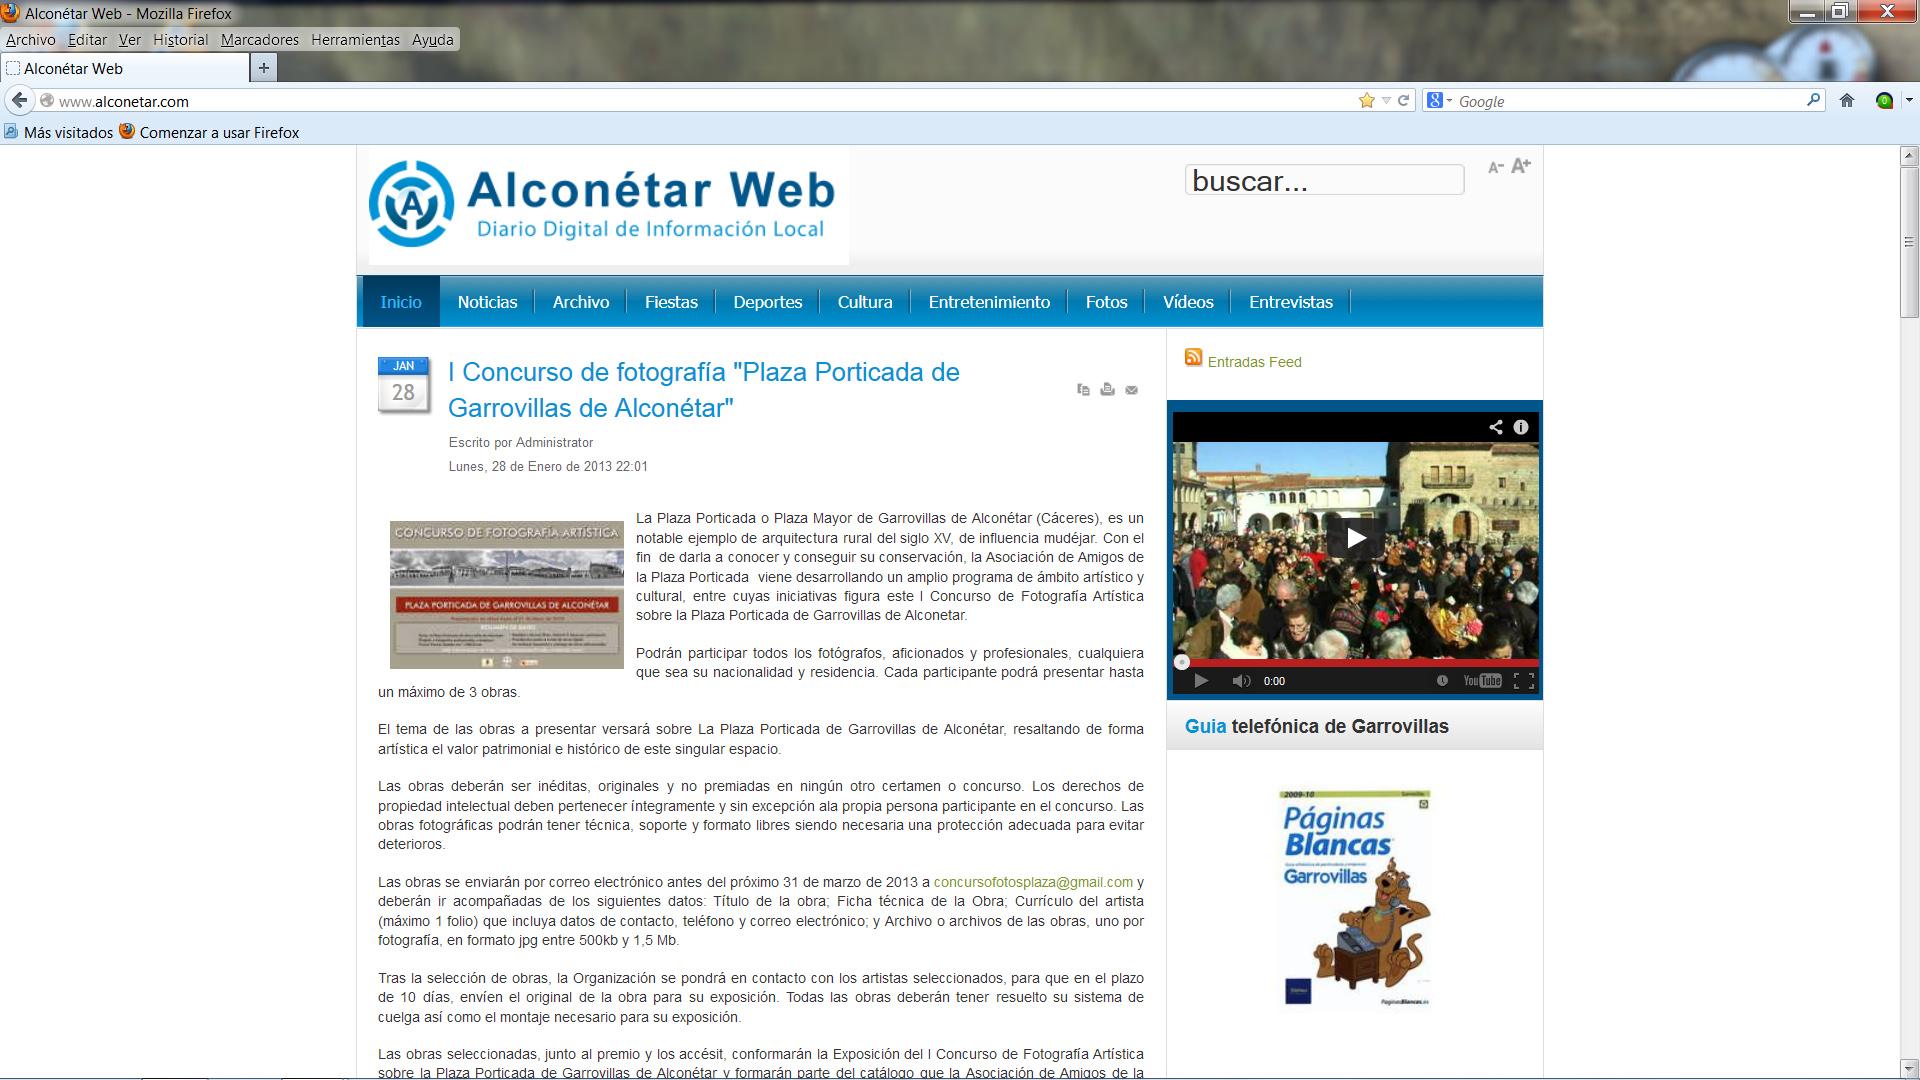 Alconétar Web